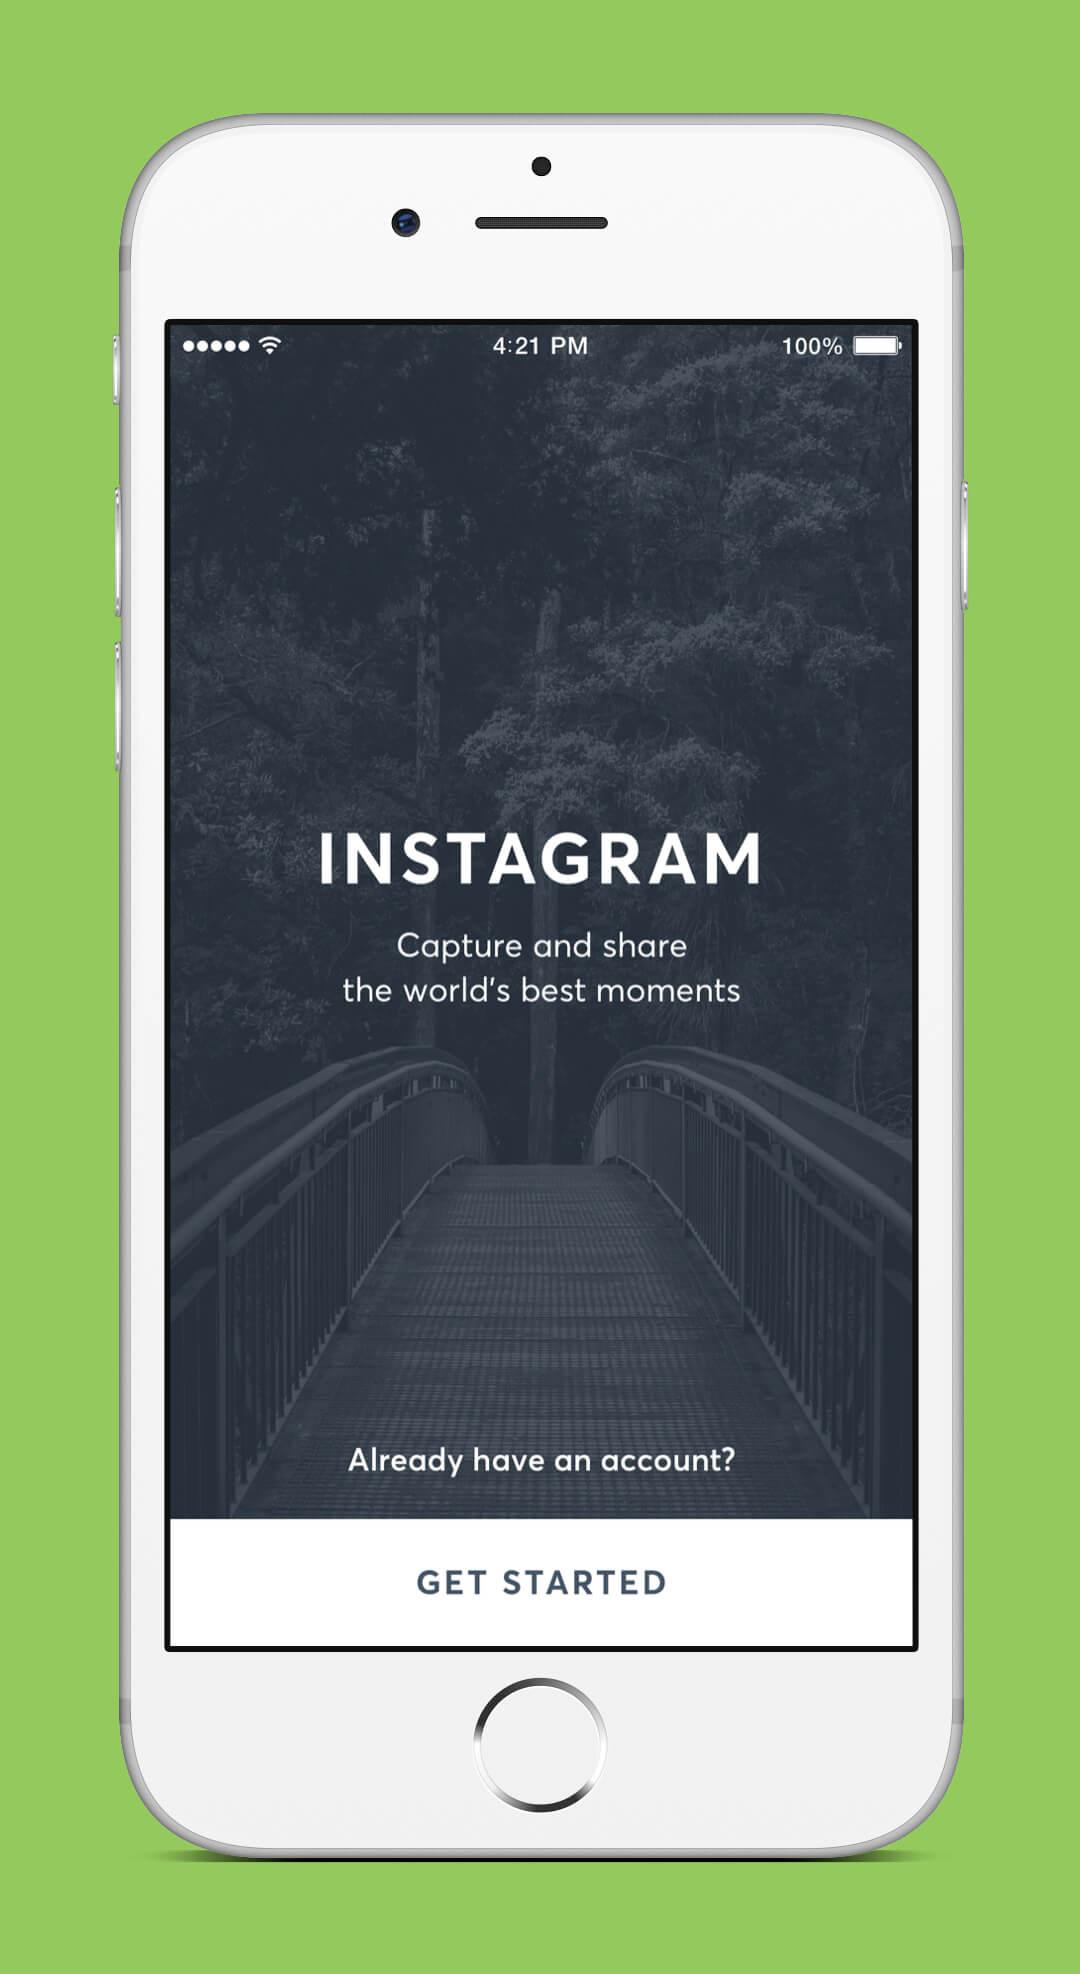 Instagram Redesign - Splash Screen